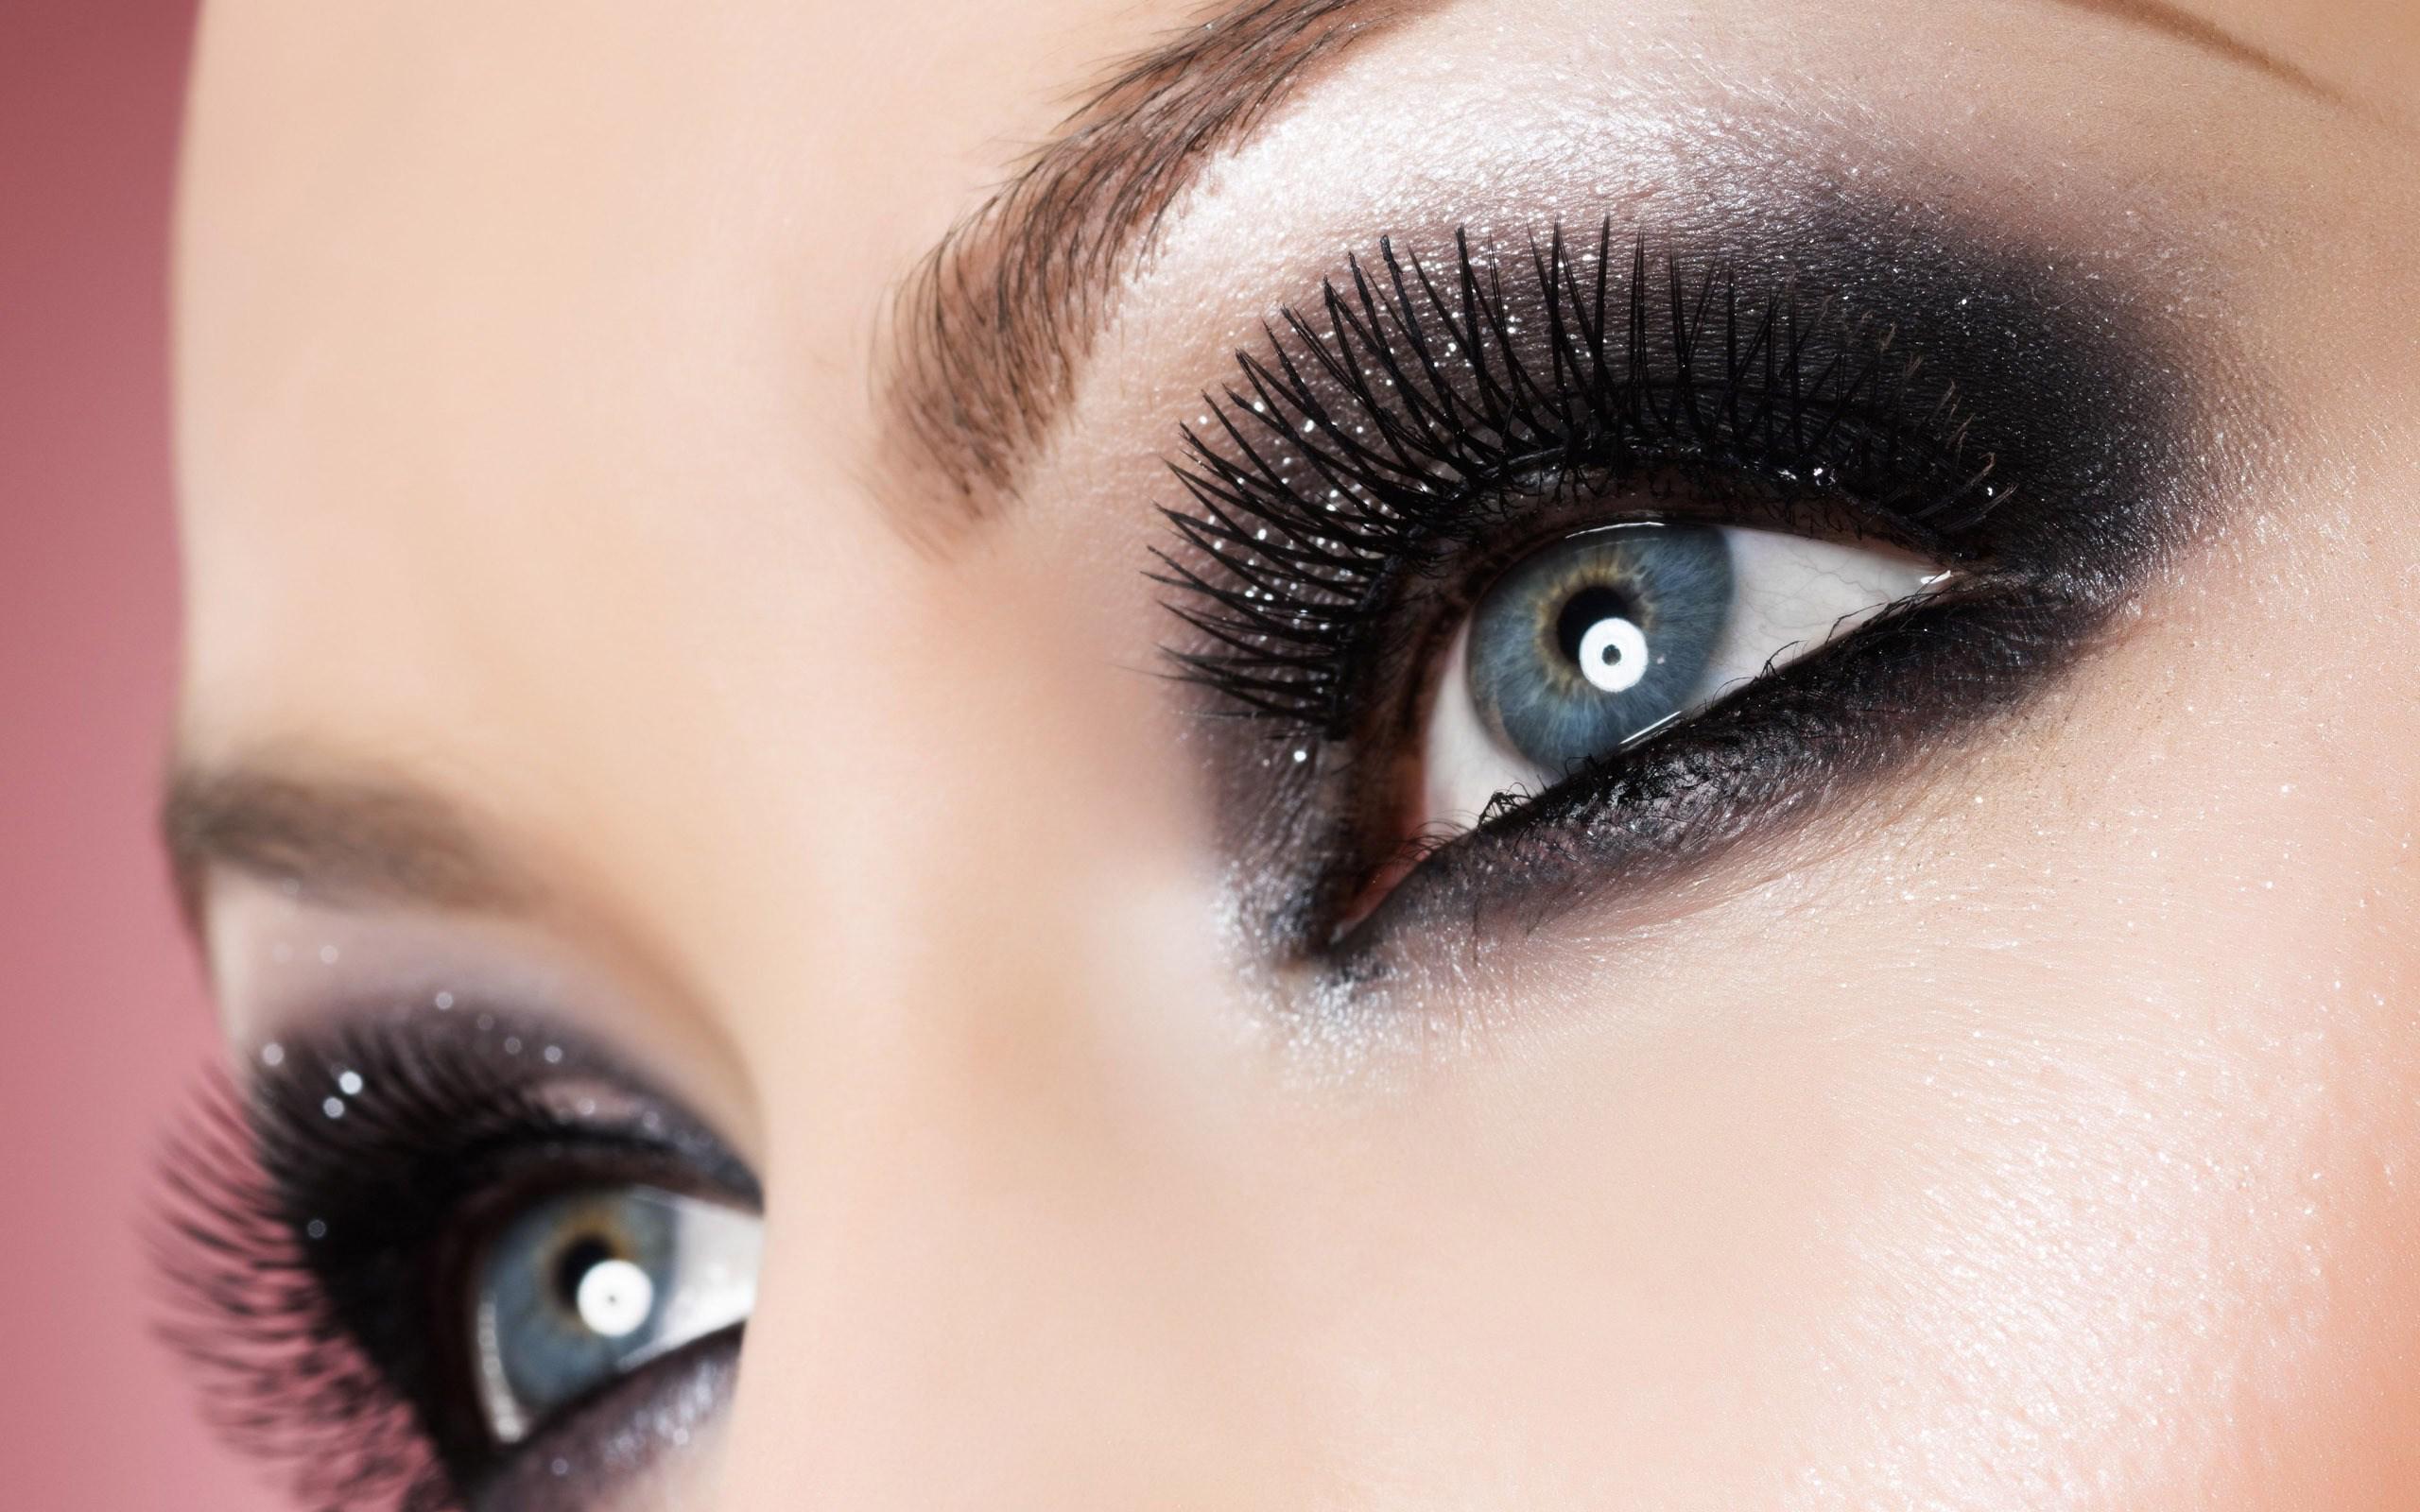 Hd Beautiful Eyes Download Wallpaper - Beautiful Eyes Images Hd - HD Wallpaper